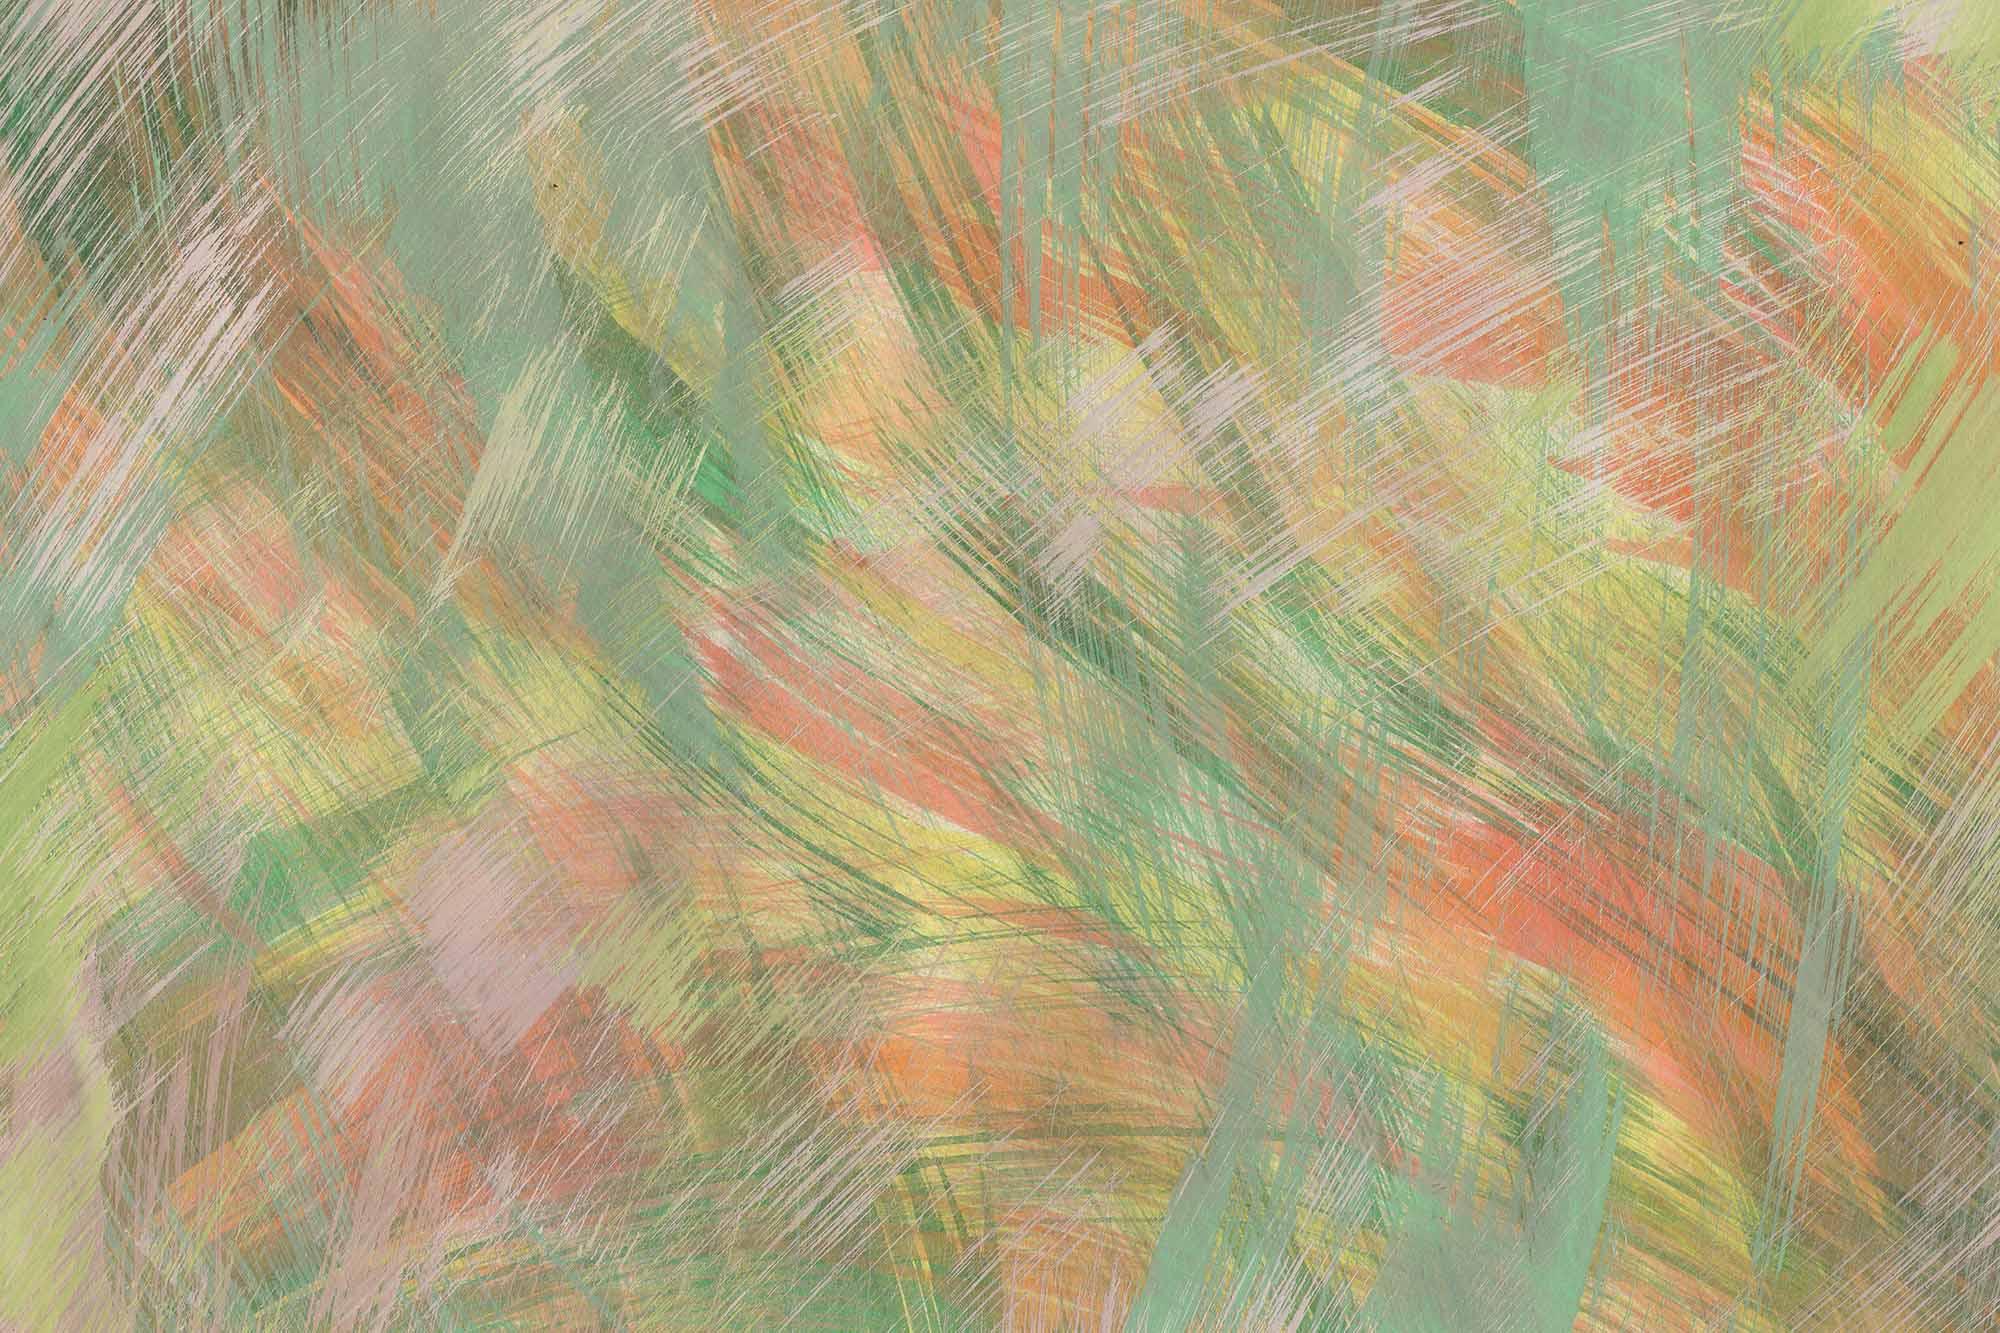 Modern Abstract Acrylic Textures 8